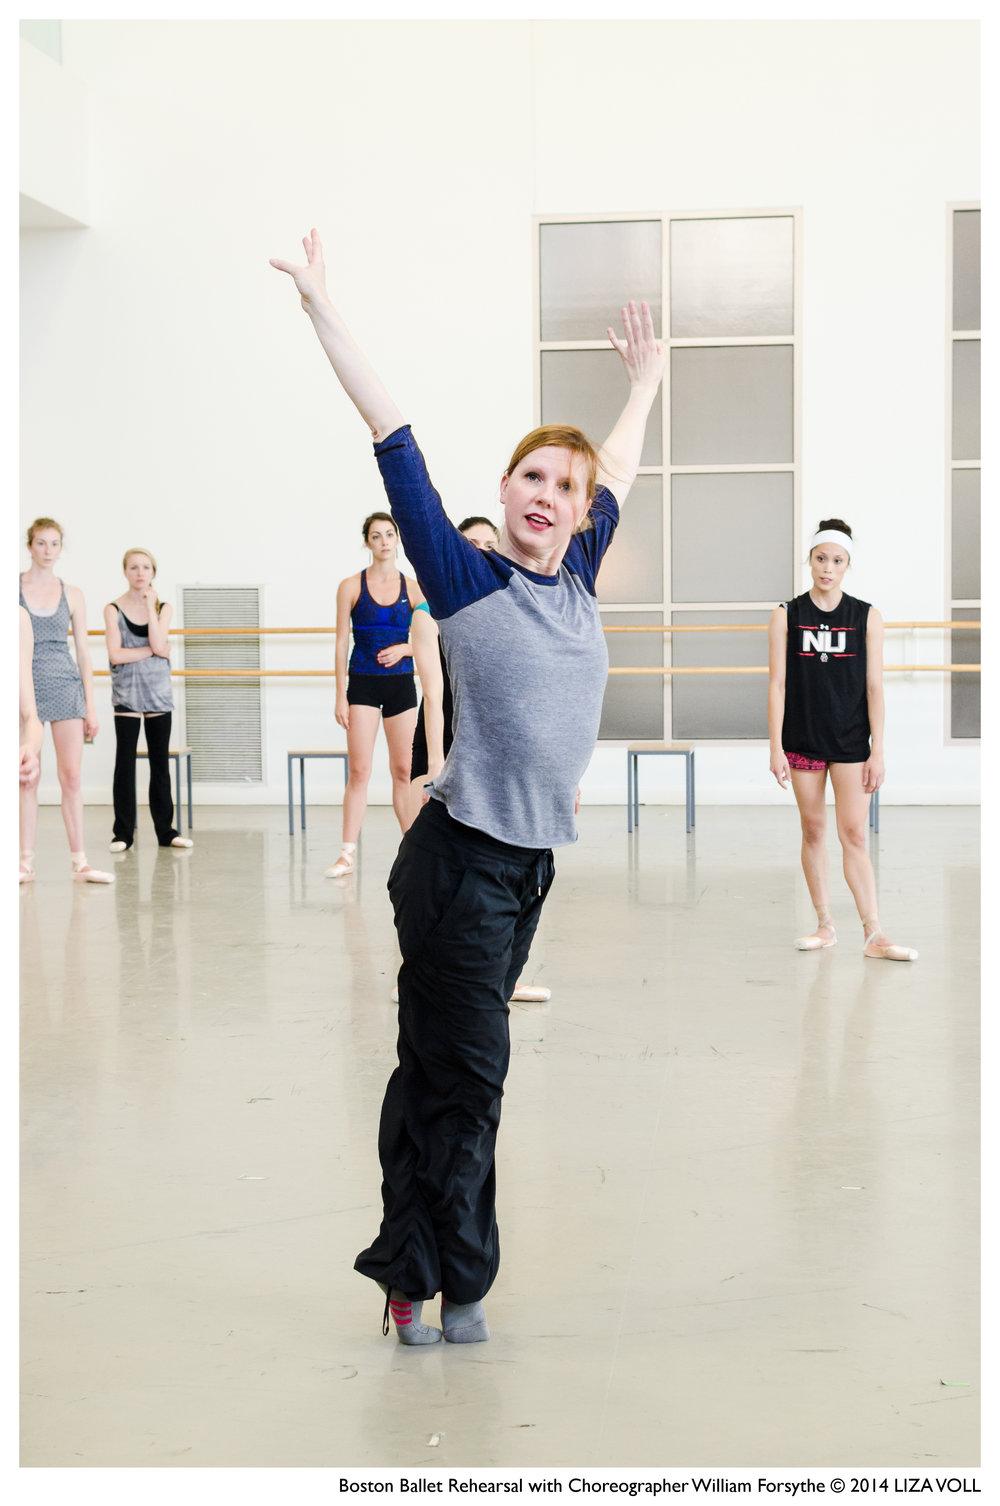 Jill Johnson rehearsing with Boston Ballet;photo by Liza Voll Photography, courtesy of Boston Ballet